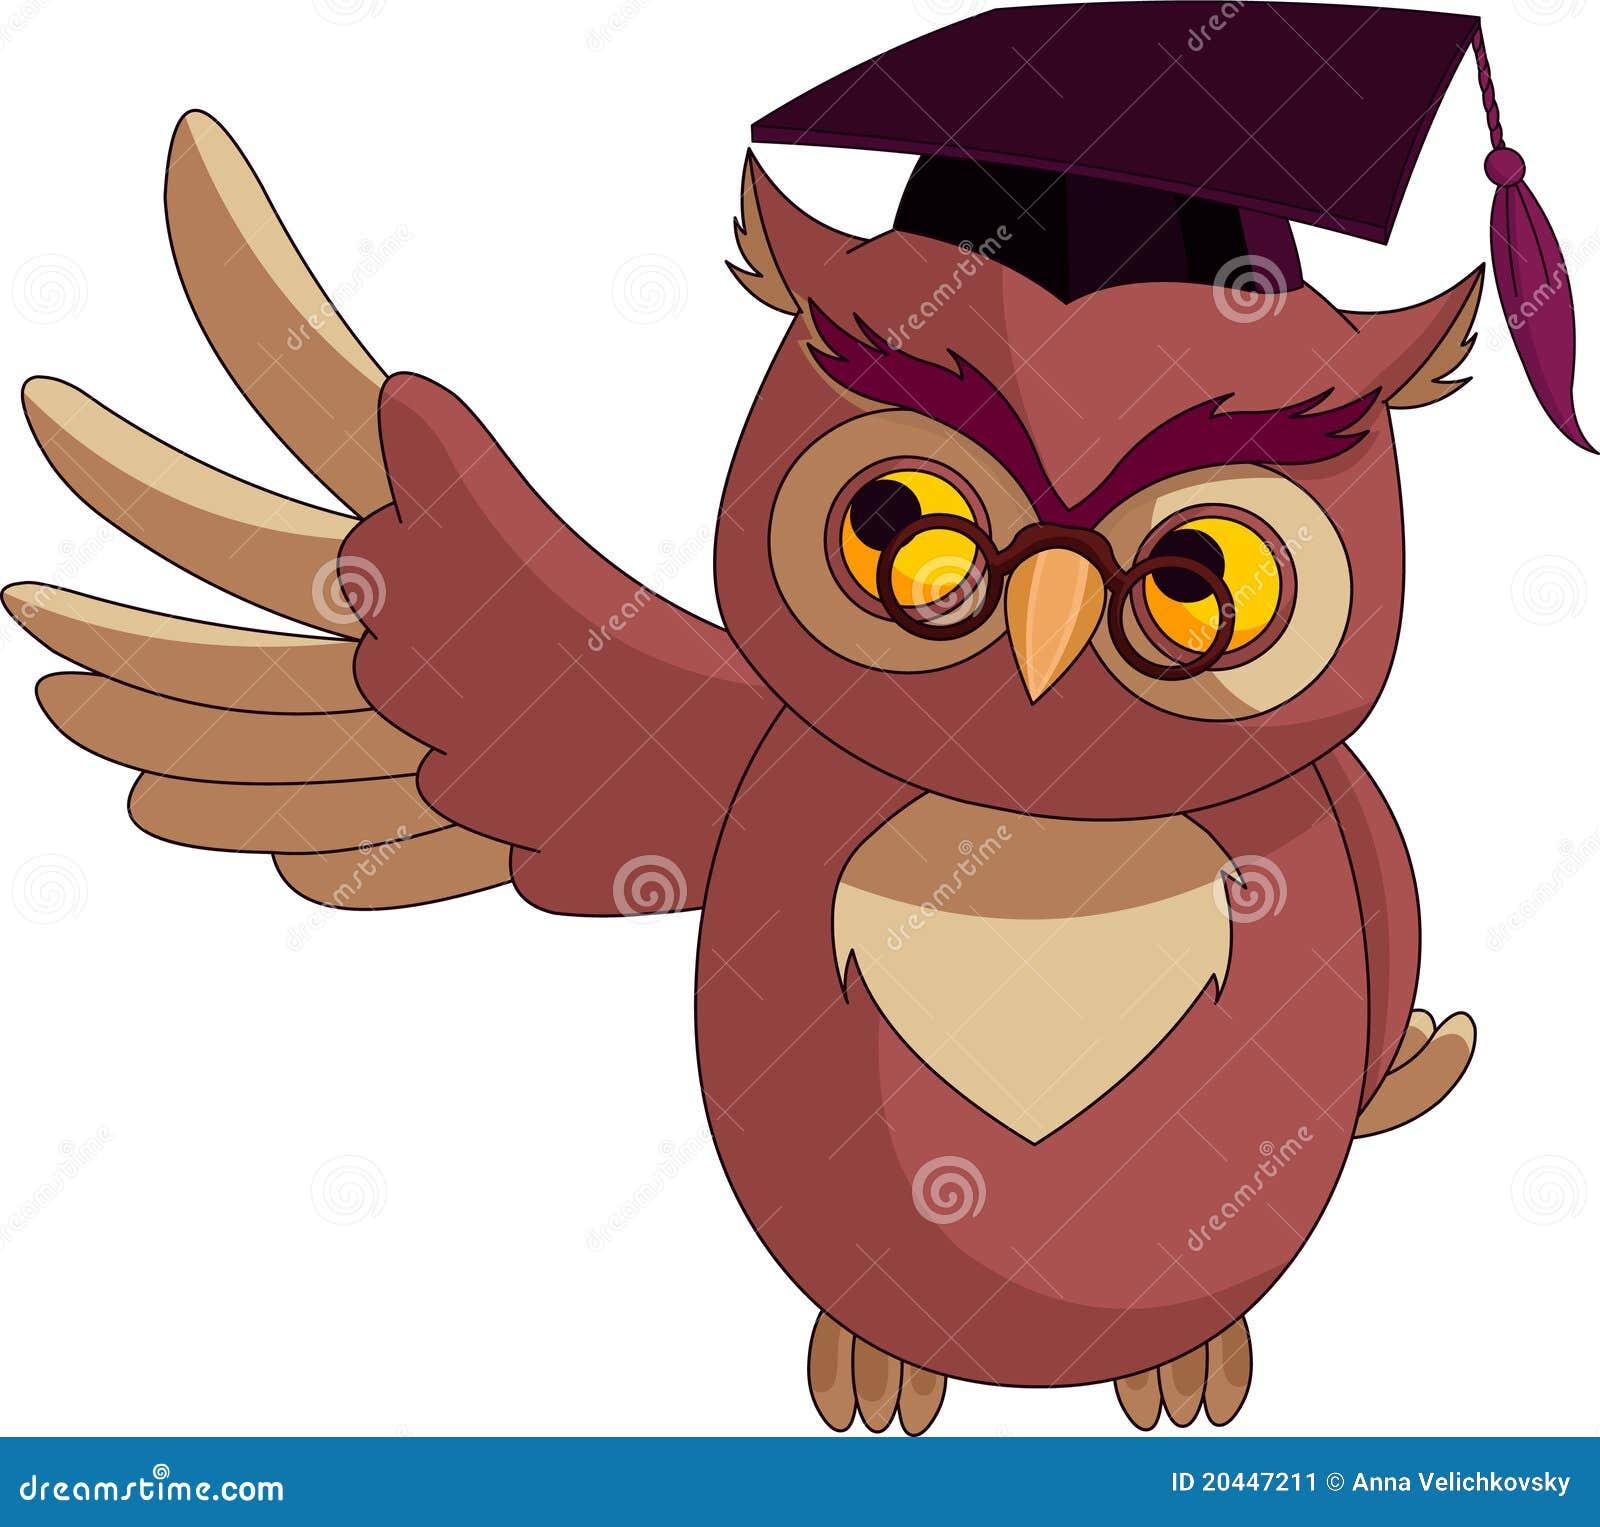 Cartoon Owl with Graduation Cap